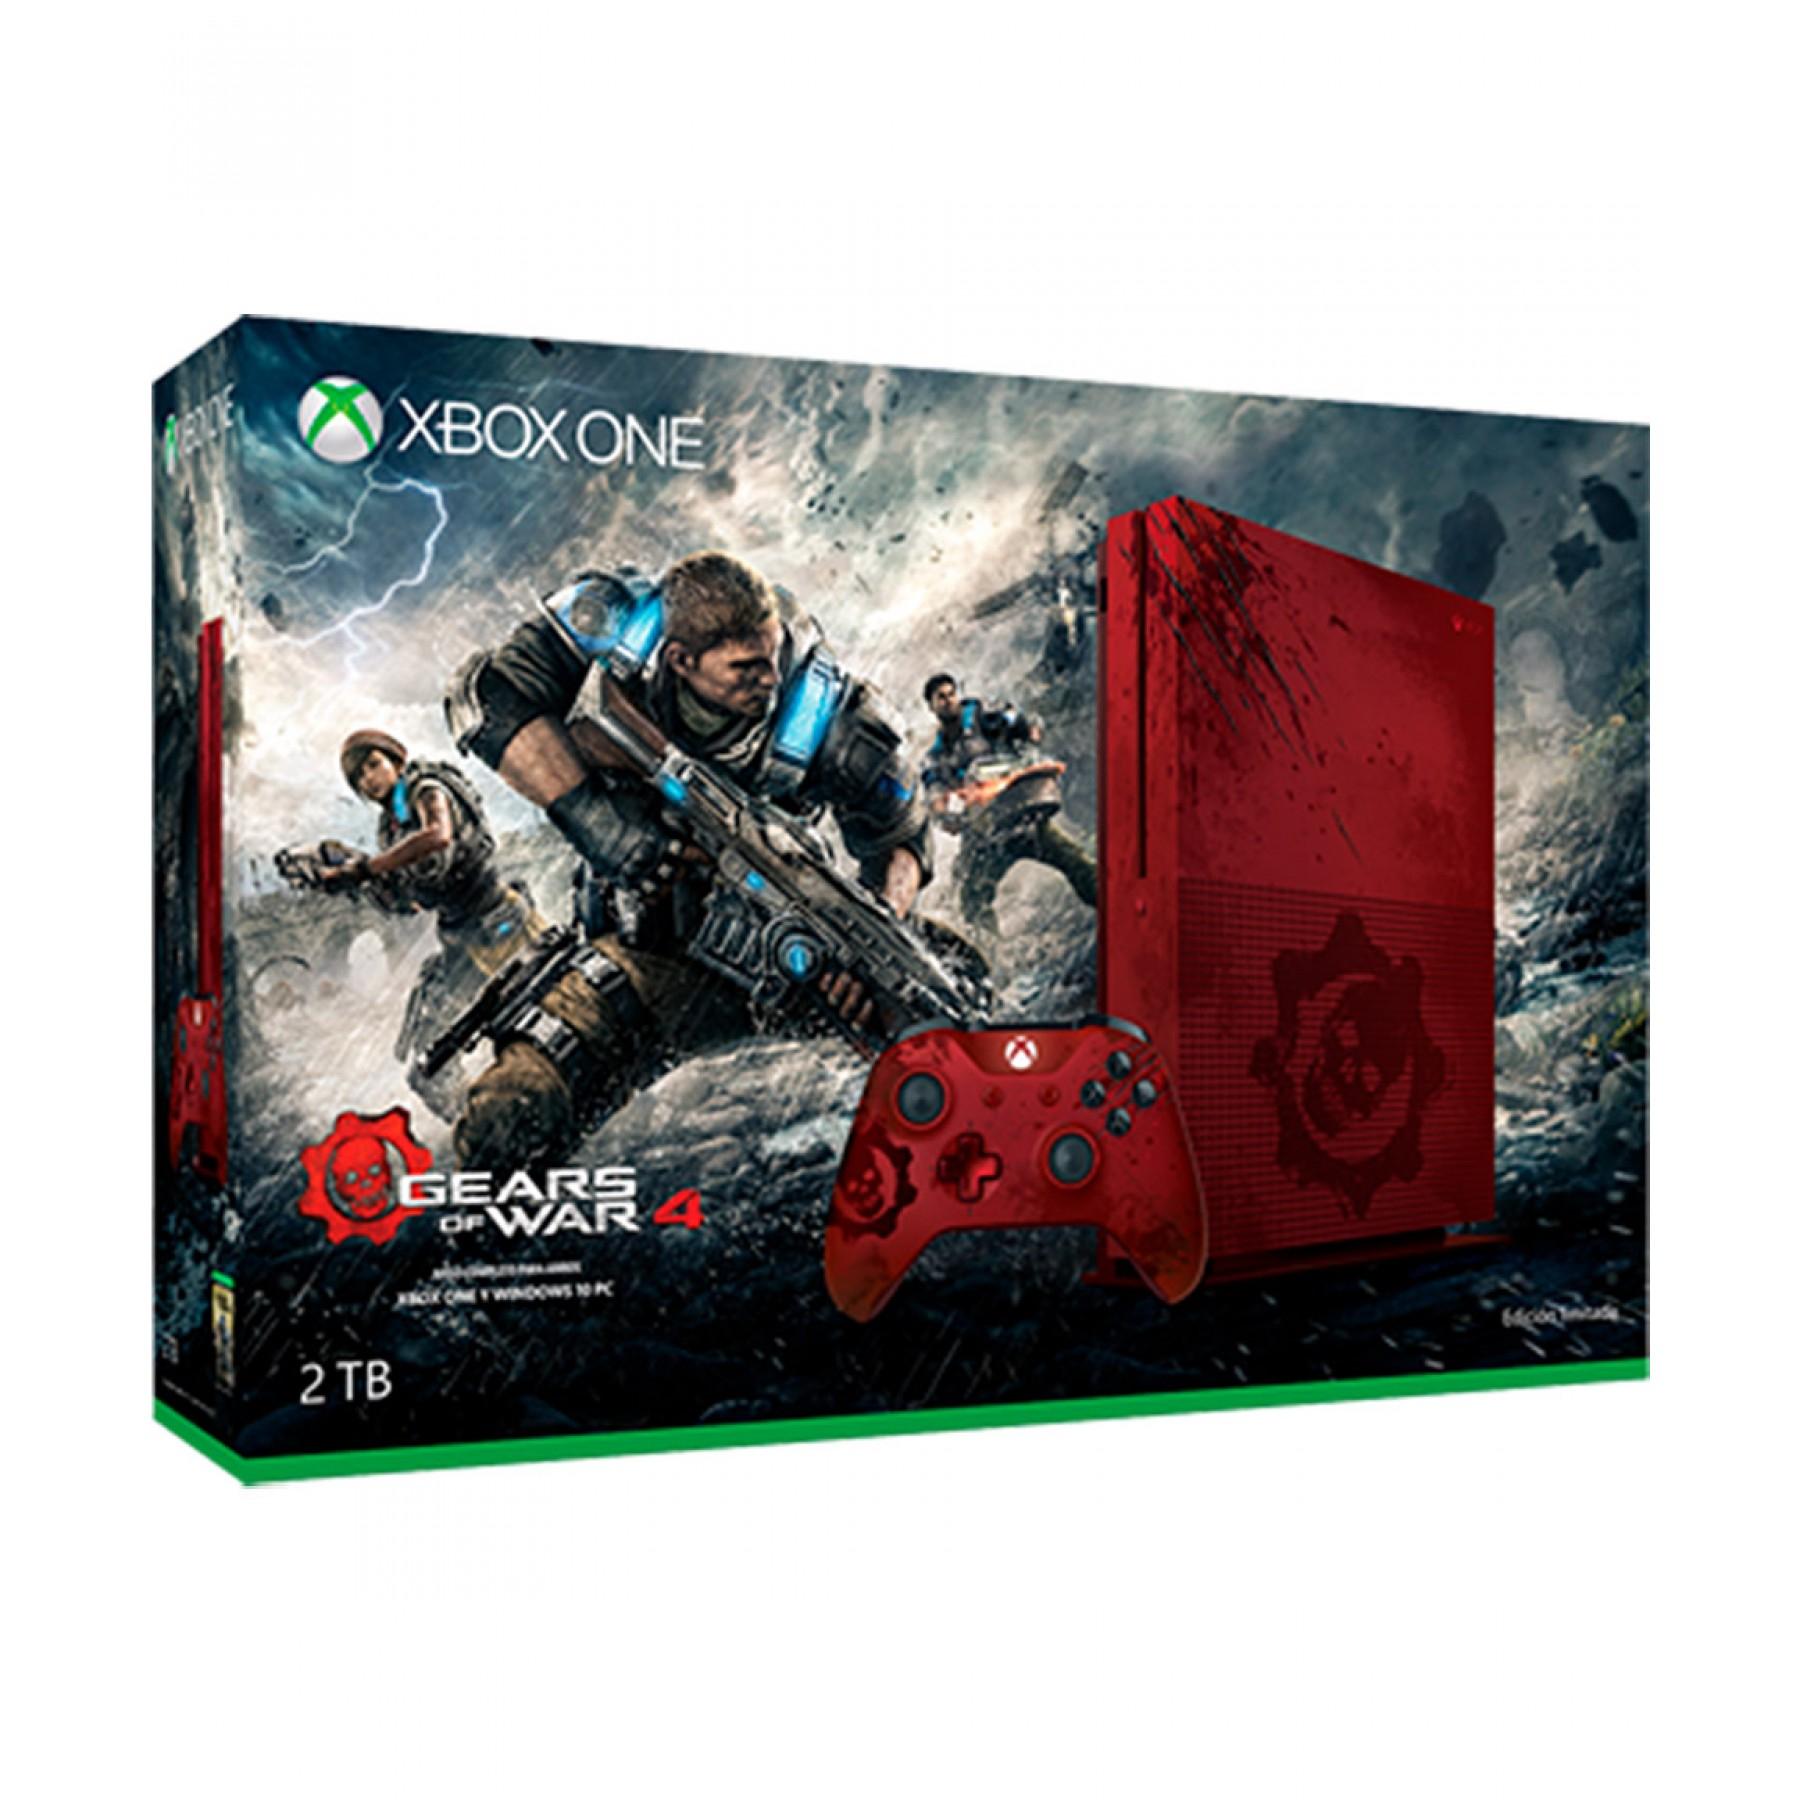 PALACIO DE HIERRO: XBOX ONE CONSOLA XBOX ONE S 2 TB + GEARS OF WAR 4 + XBOX LIVE 12 MESEs